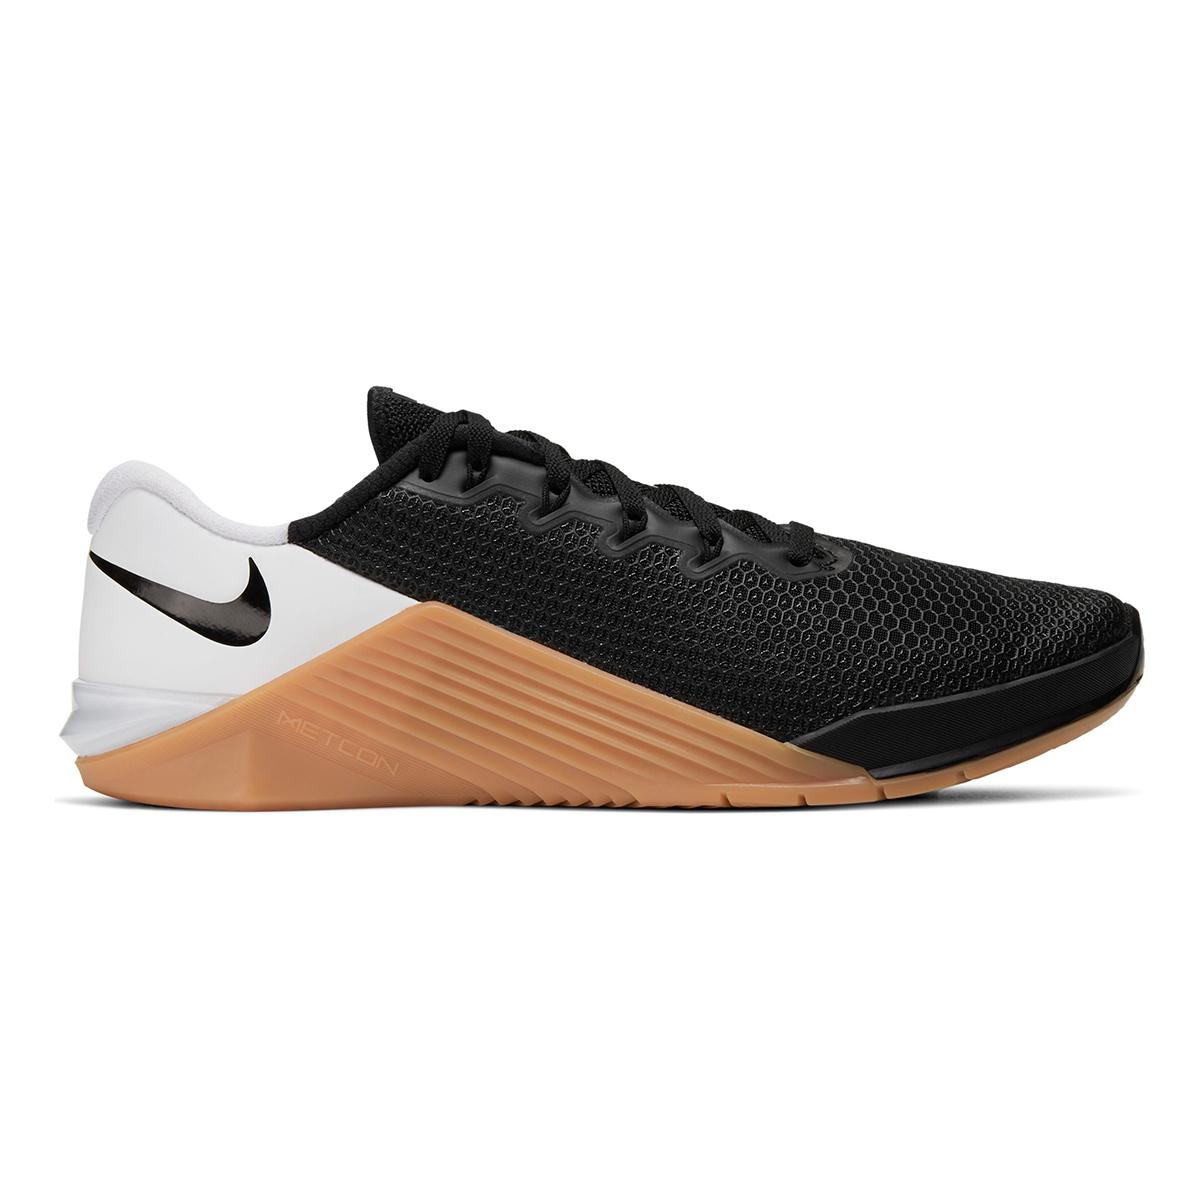 Men's Nike Metcon 5 Training Shoes  - Color: Black/White/Gum Med Brown - Size: 5 - Width: Regular, Black/White/Gum Med Brown, large, image 1